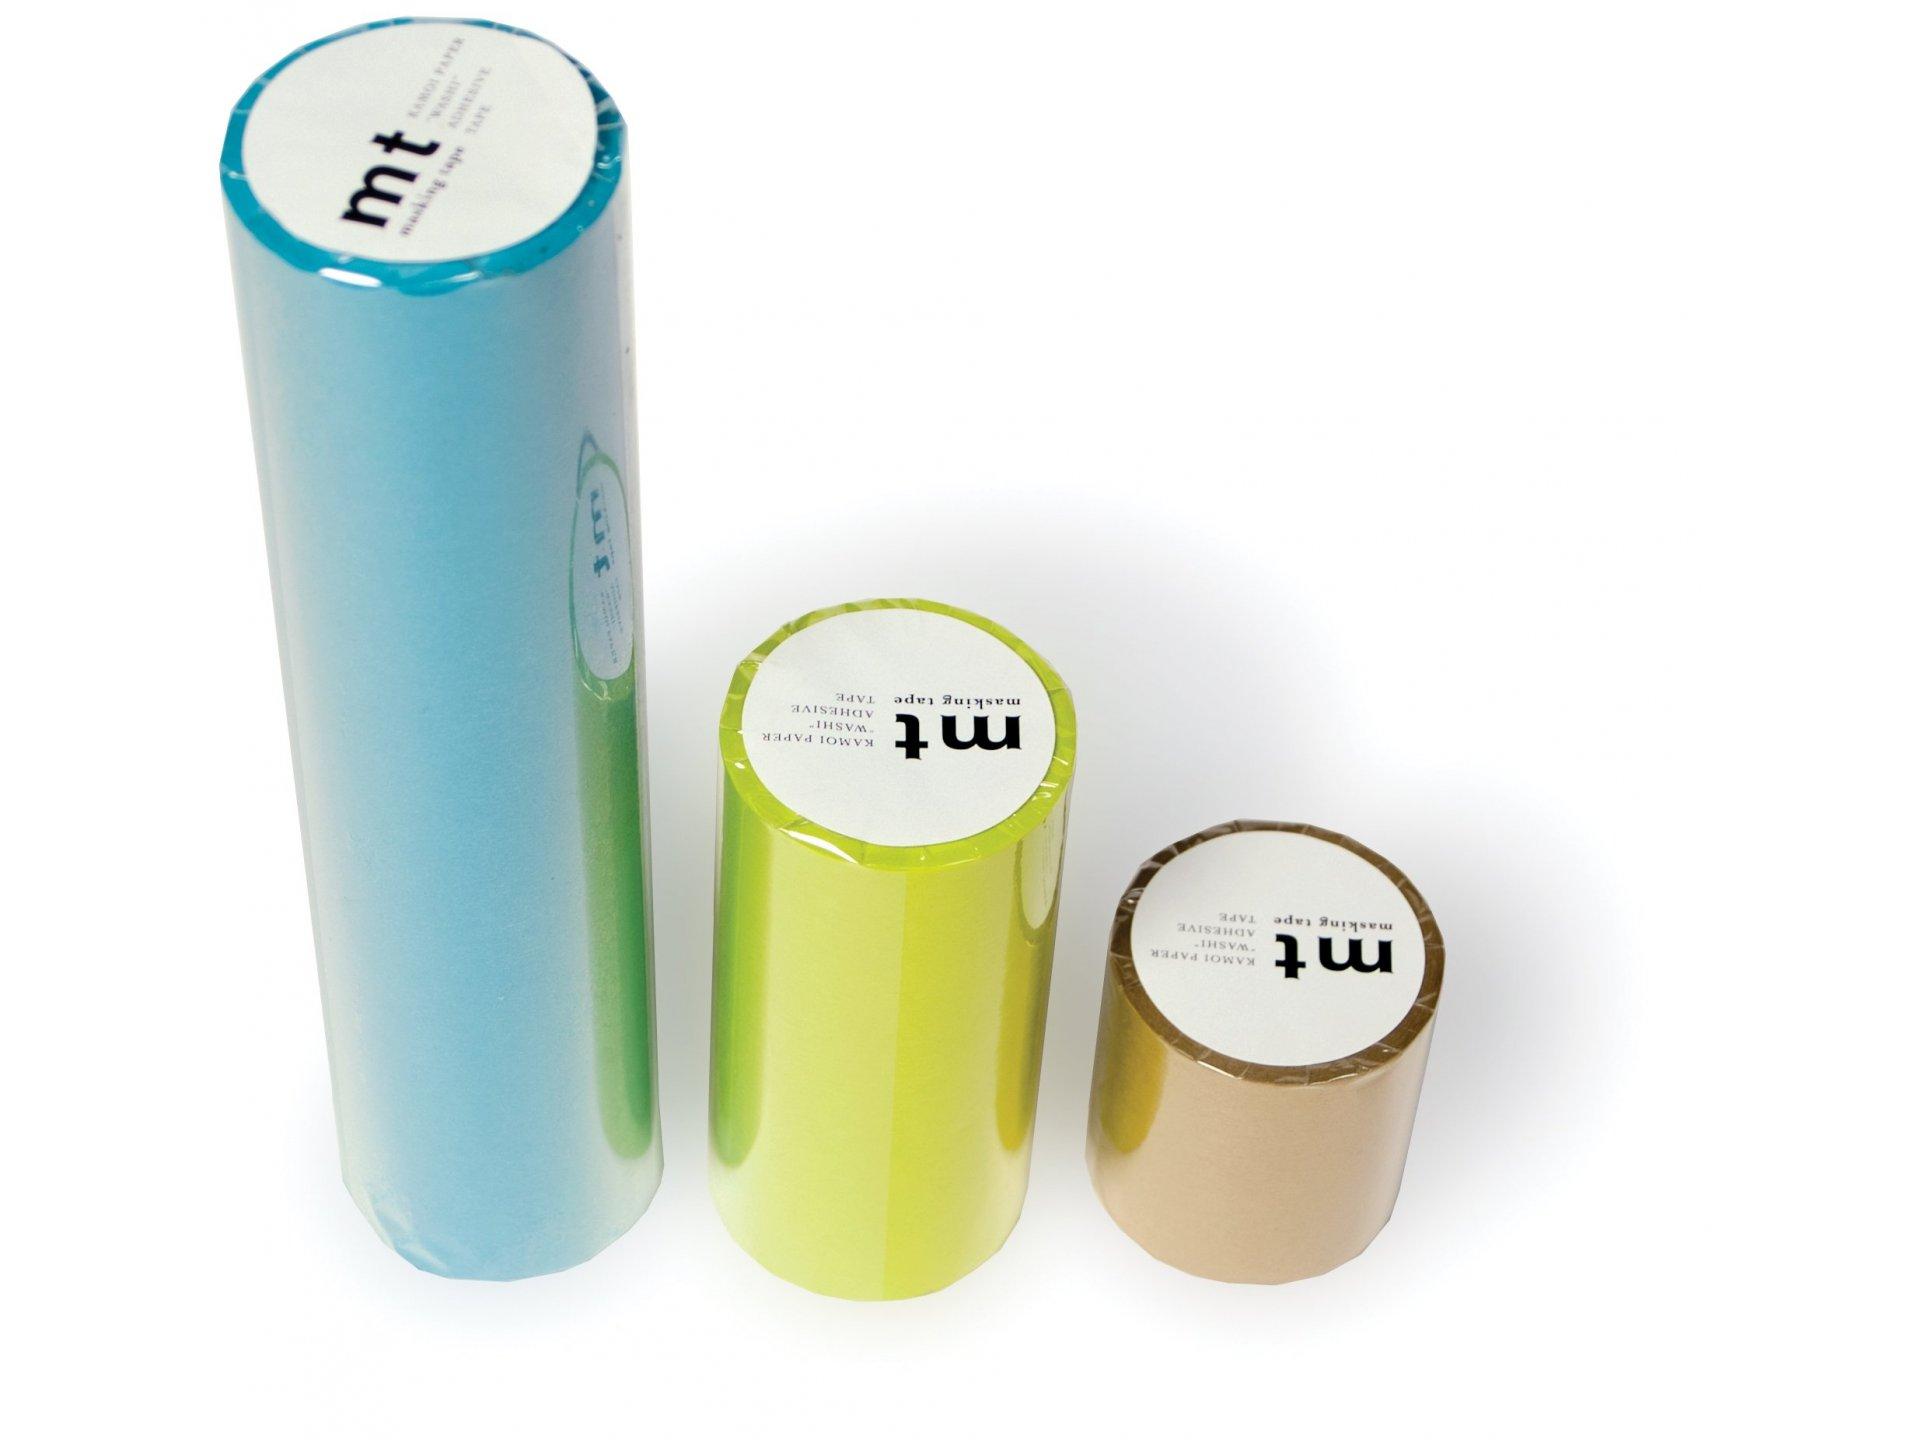 buy mt casa masking tape monochrome washi adhes tape online at modulor. Black Bedroom Furniture Sets. Home Design Ideas